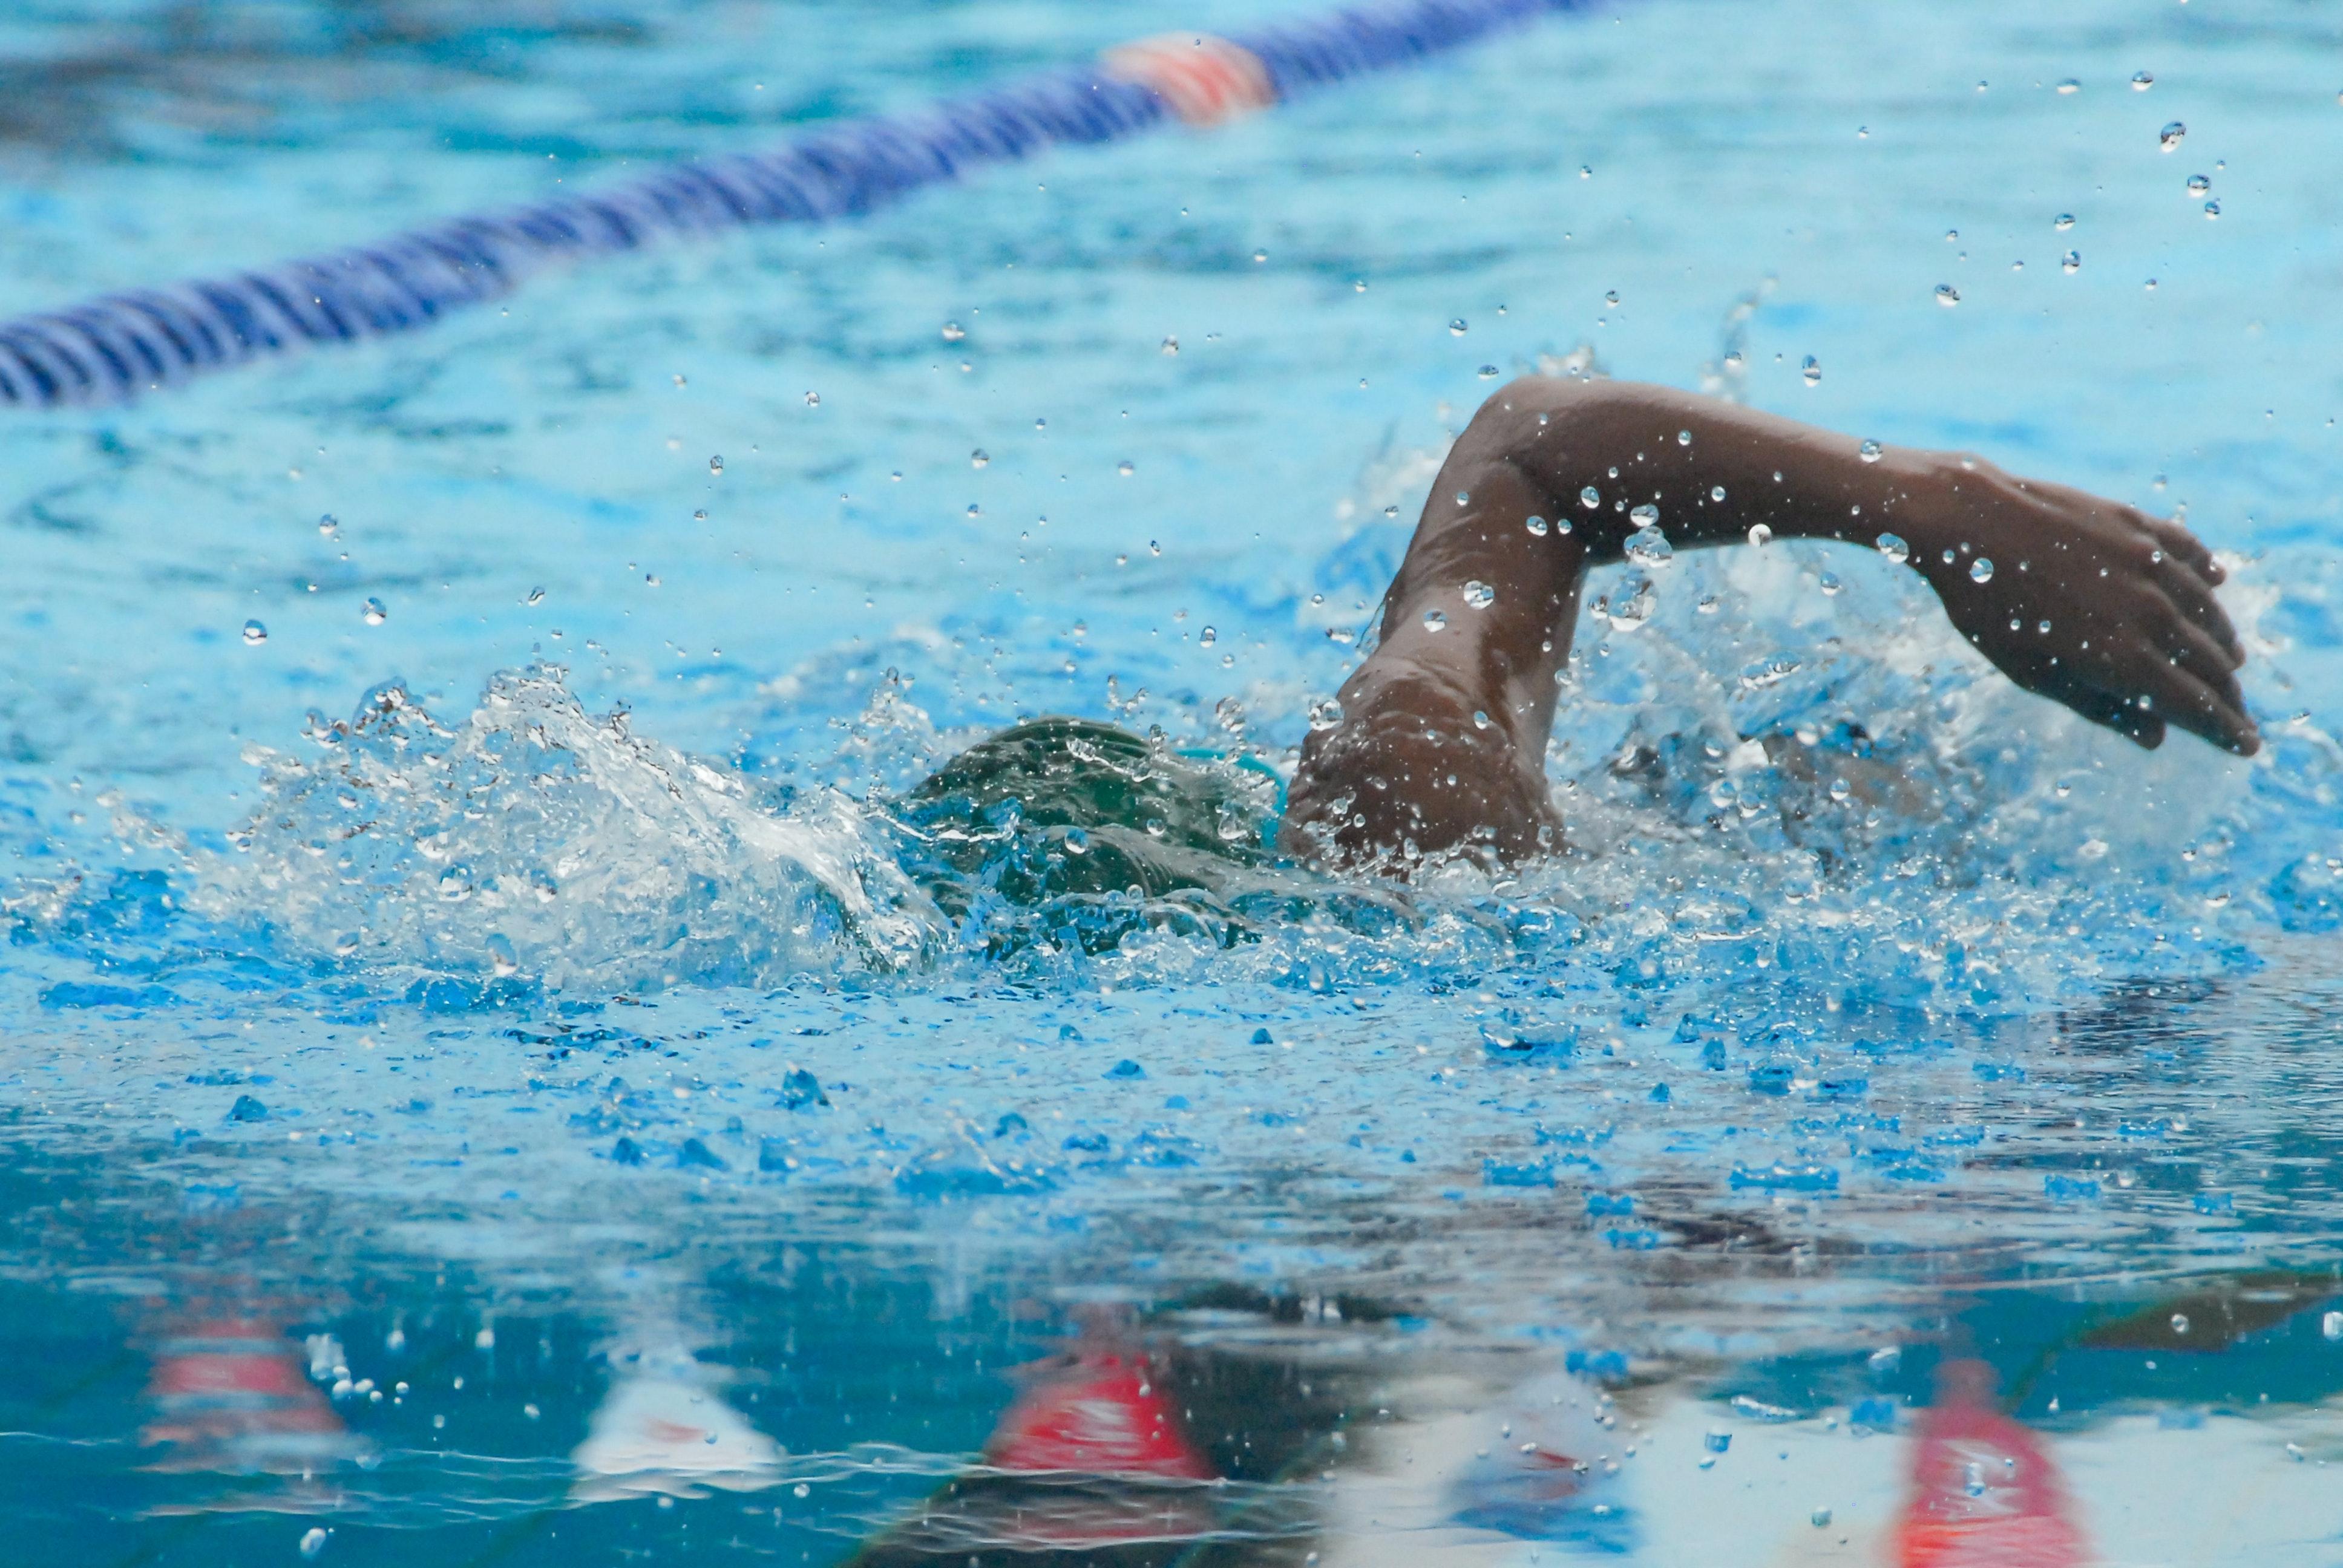 tratamiento osteopatía deportes de agua bilbao